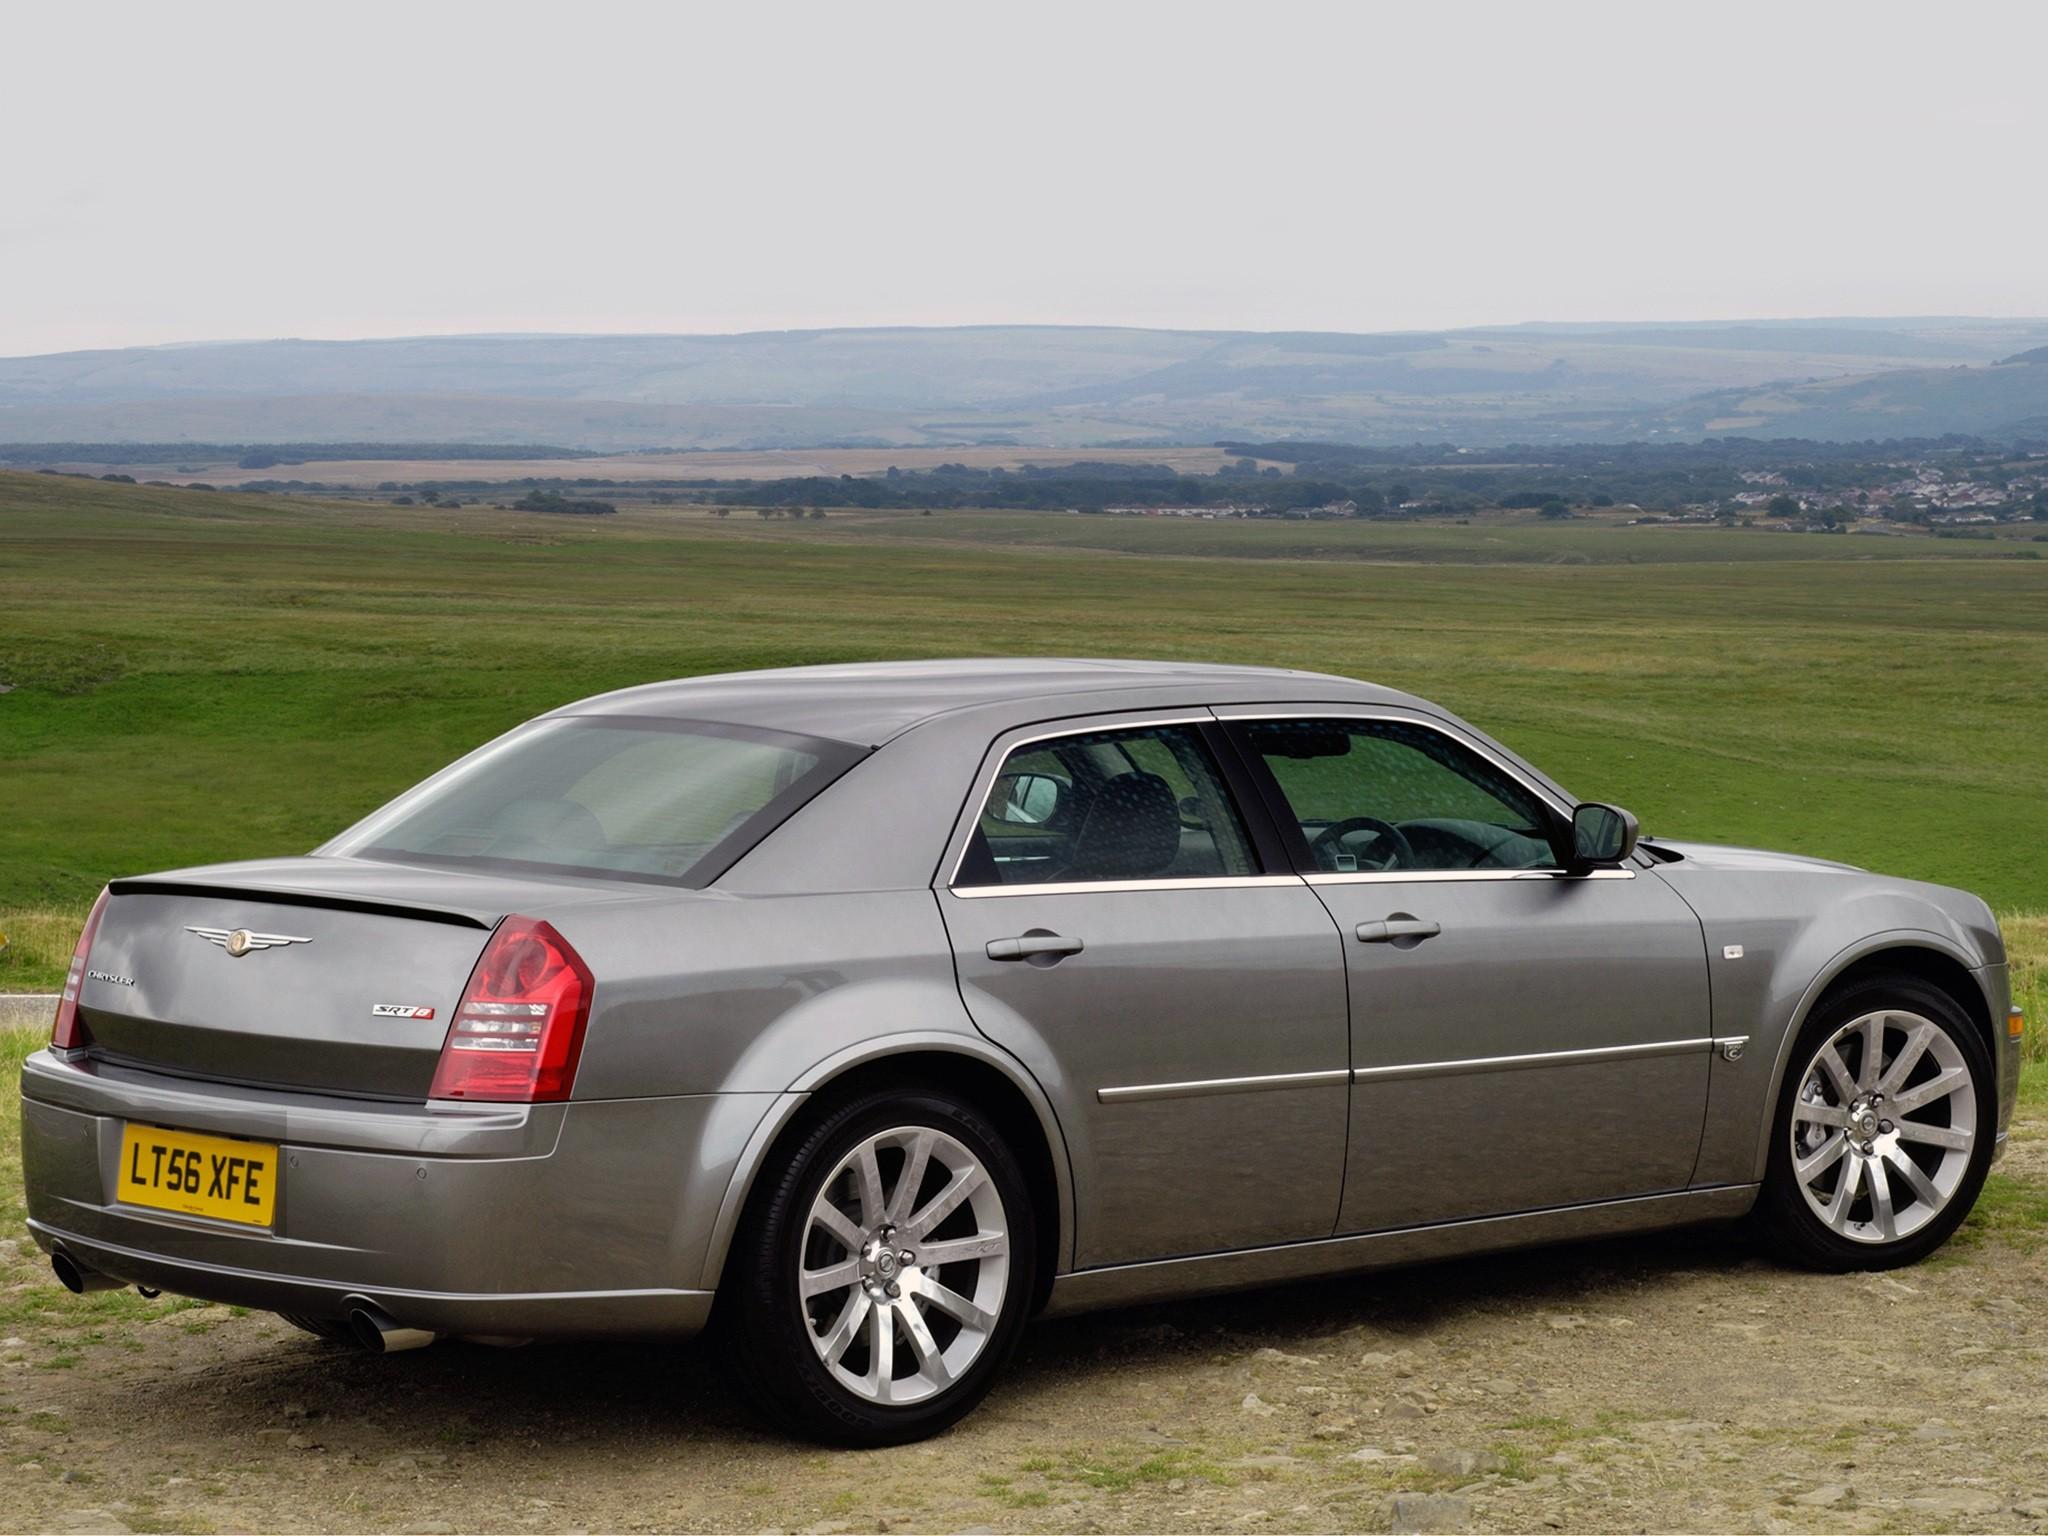 Chrysler 300 2016 Hemi >> CHRYSLER 300C SRT8 specs & photos - 2005, 2006, 2007, 2008, 2009, 2010 - autoevolution